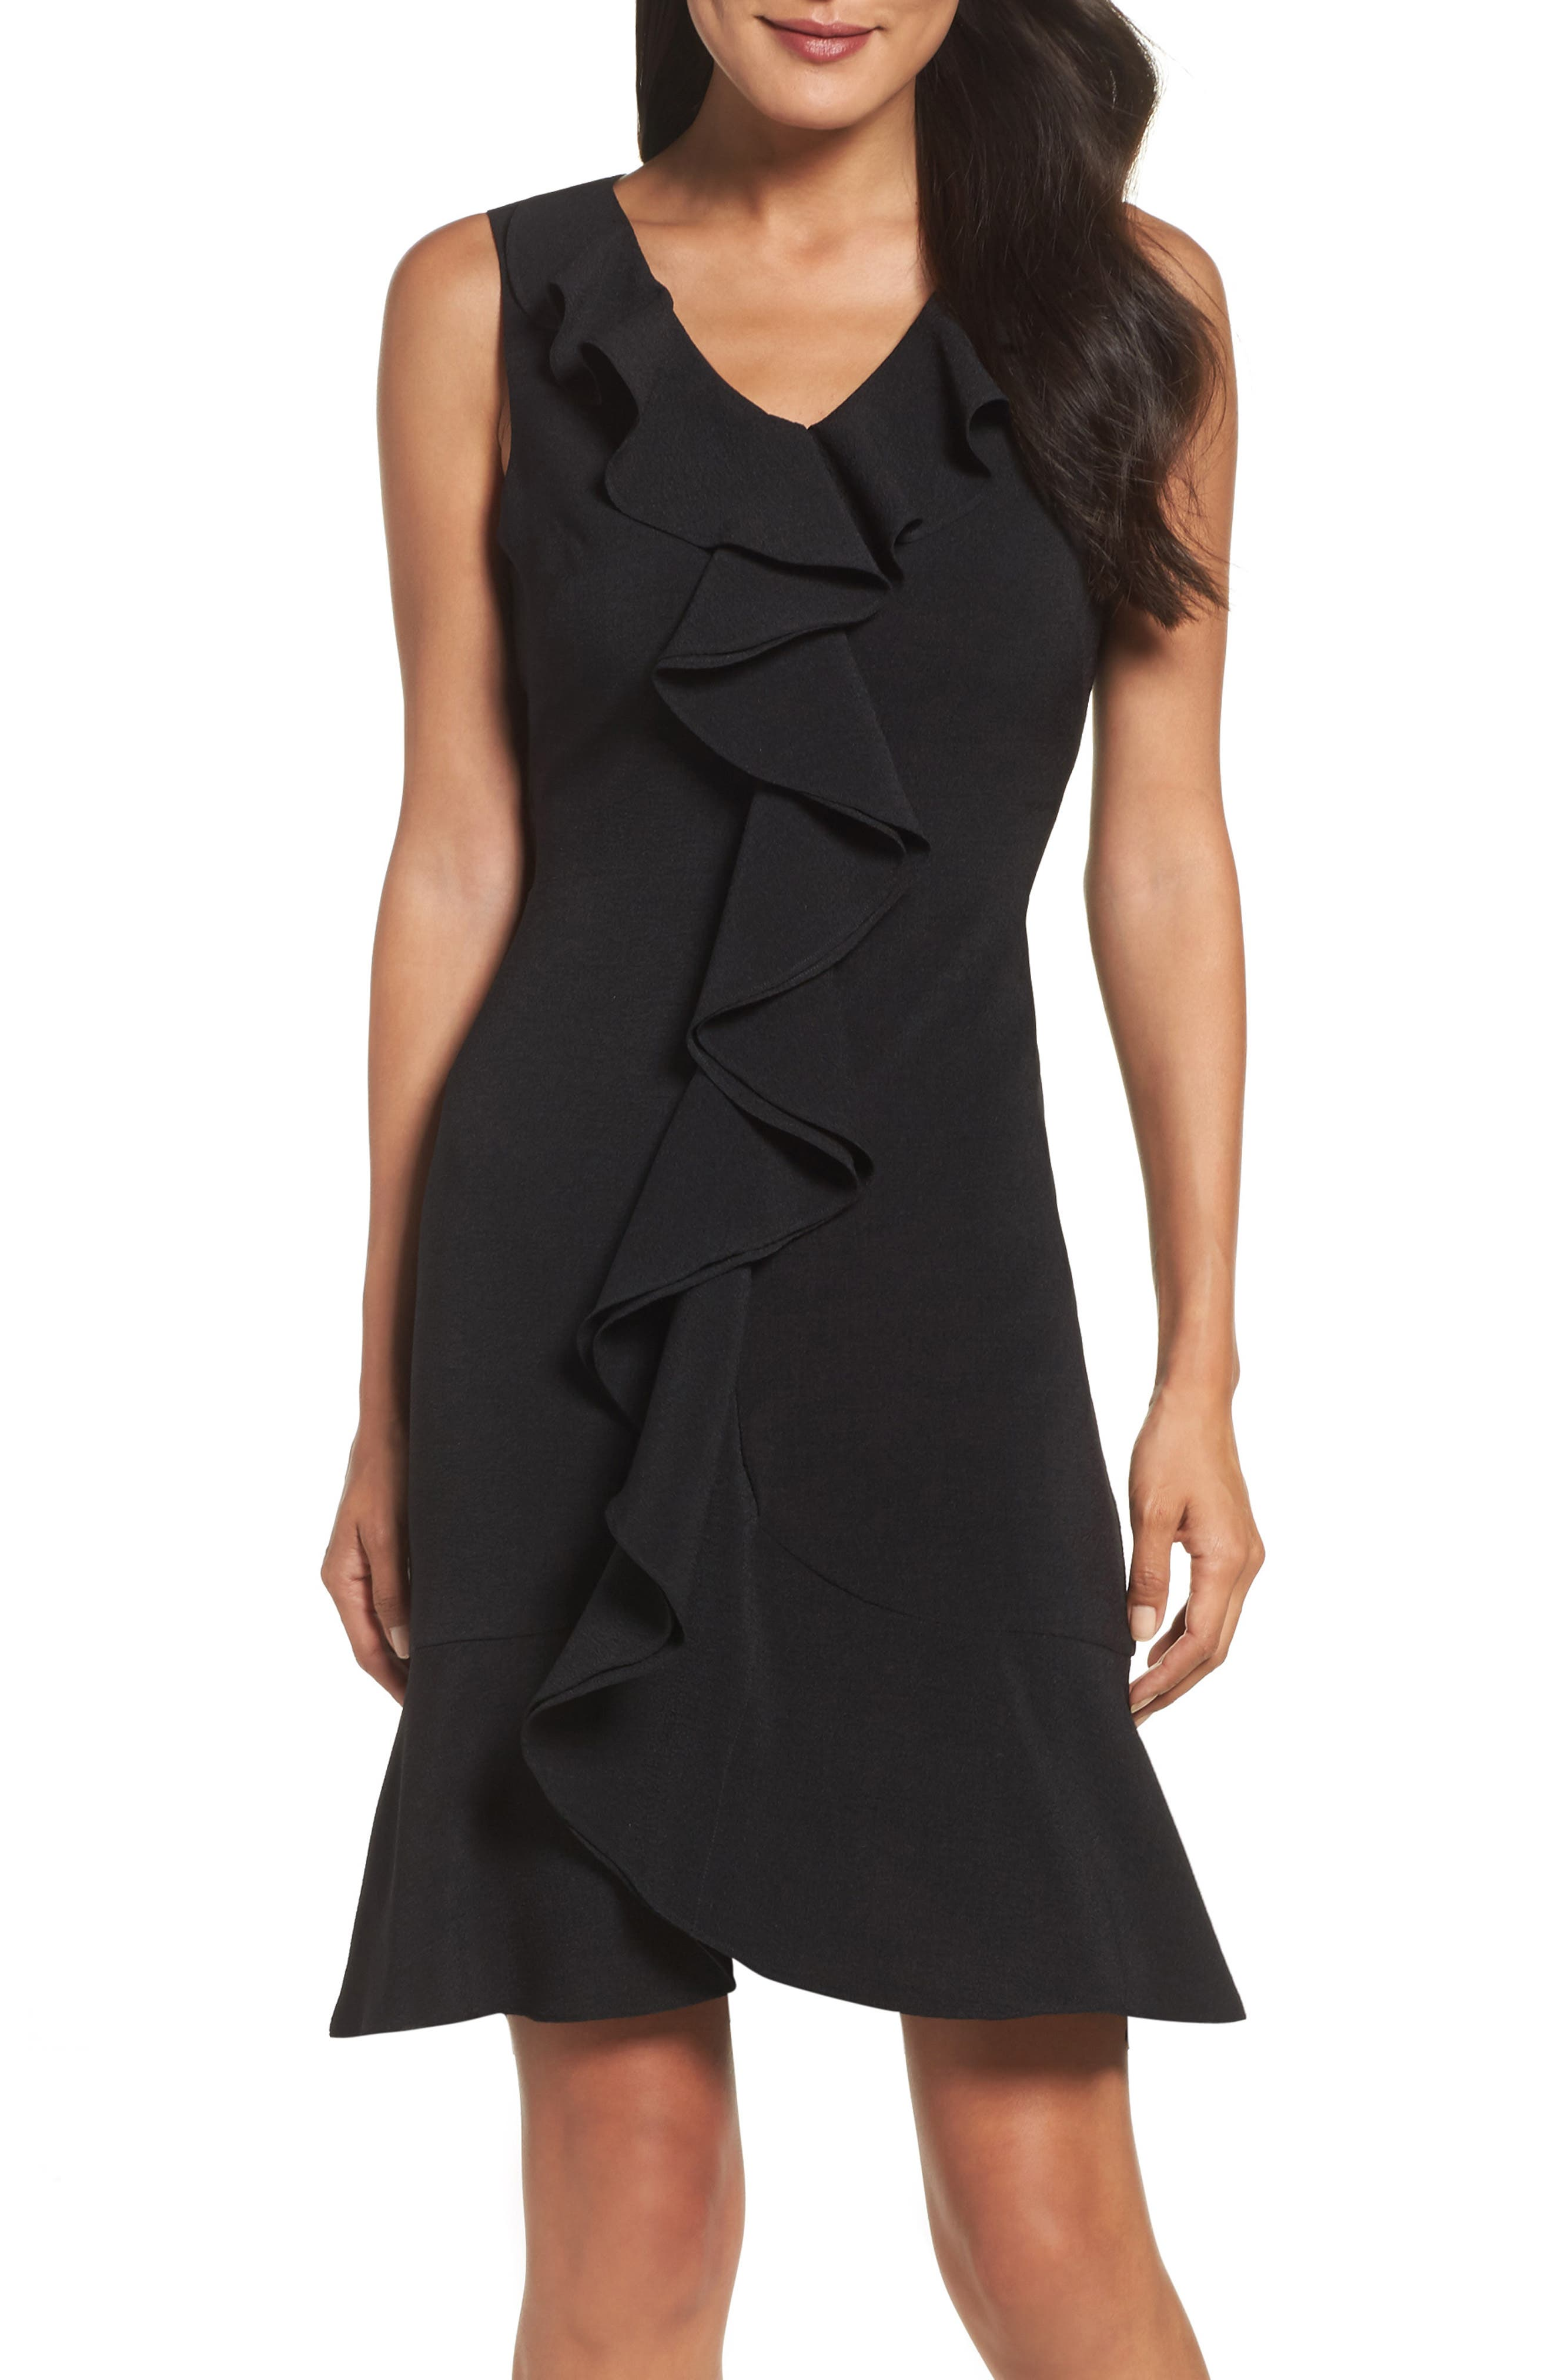 Gabby Skye Ruffle Crepe Dress